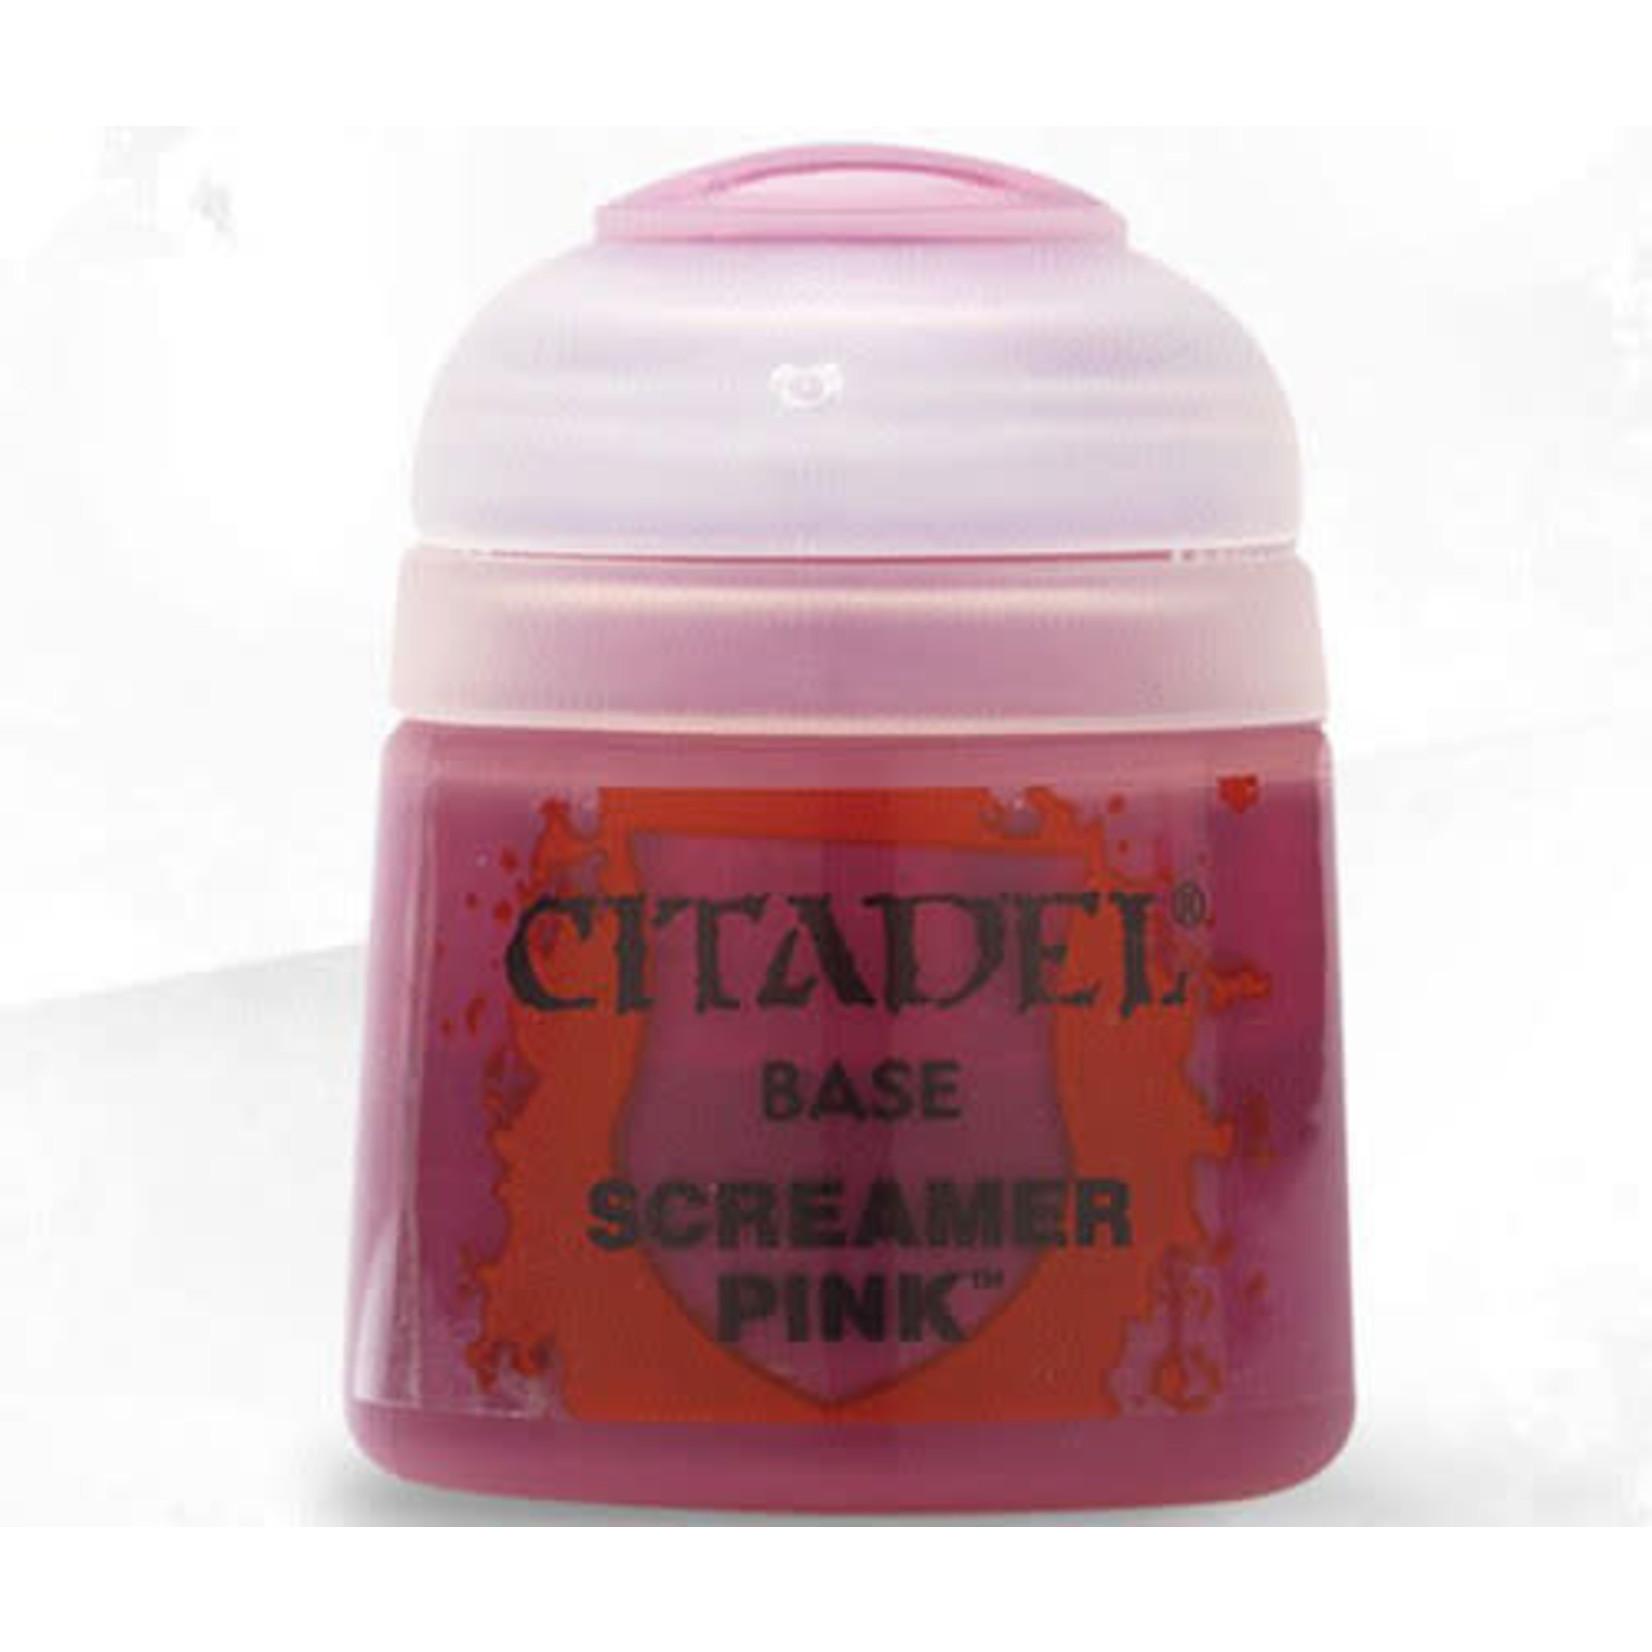 Citadel Citadel Paint - Base: Screamer Pink